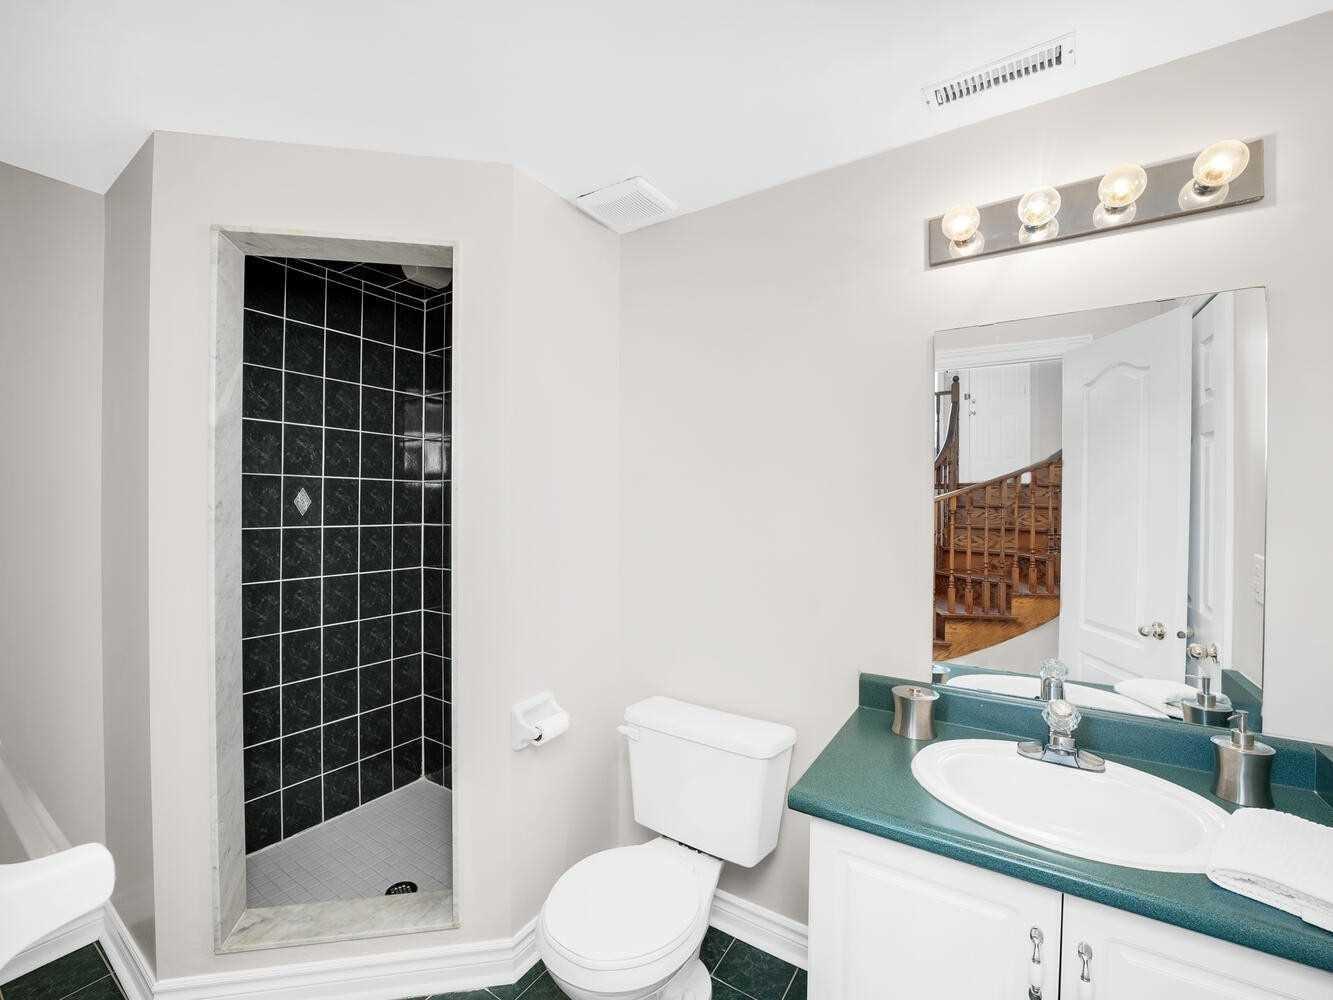 306 Avro Rd, Vaughan, Ontario L6A1X6, 3 Bedrooms Bedrooms, 6 Rooms Rooms,3 BathroomsBathrooms,Detached,For Sale,Avro,N5352789